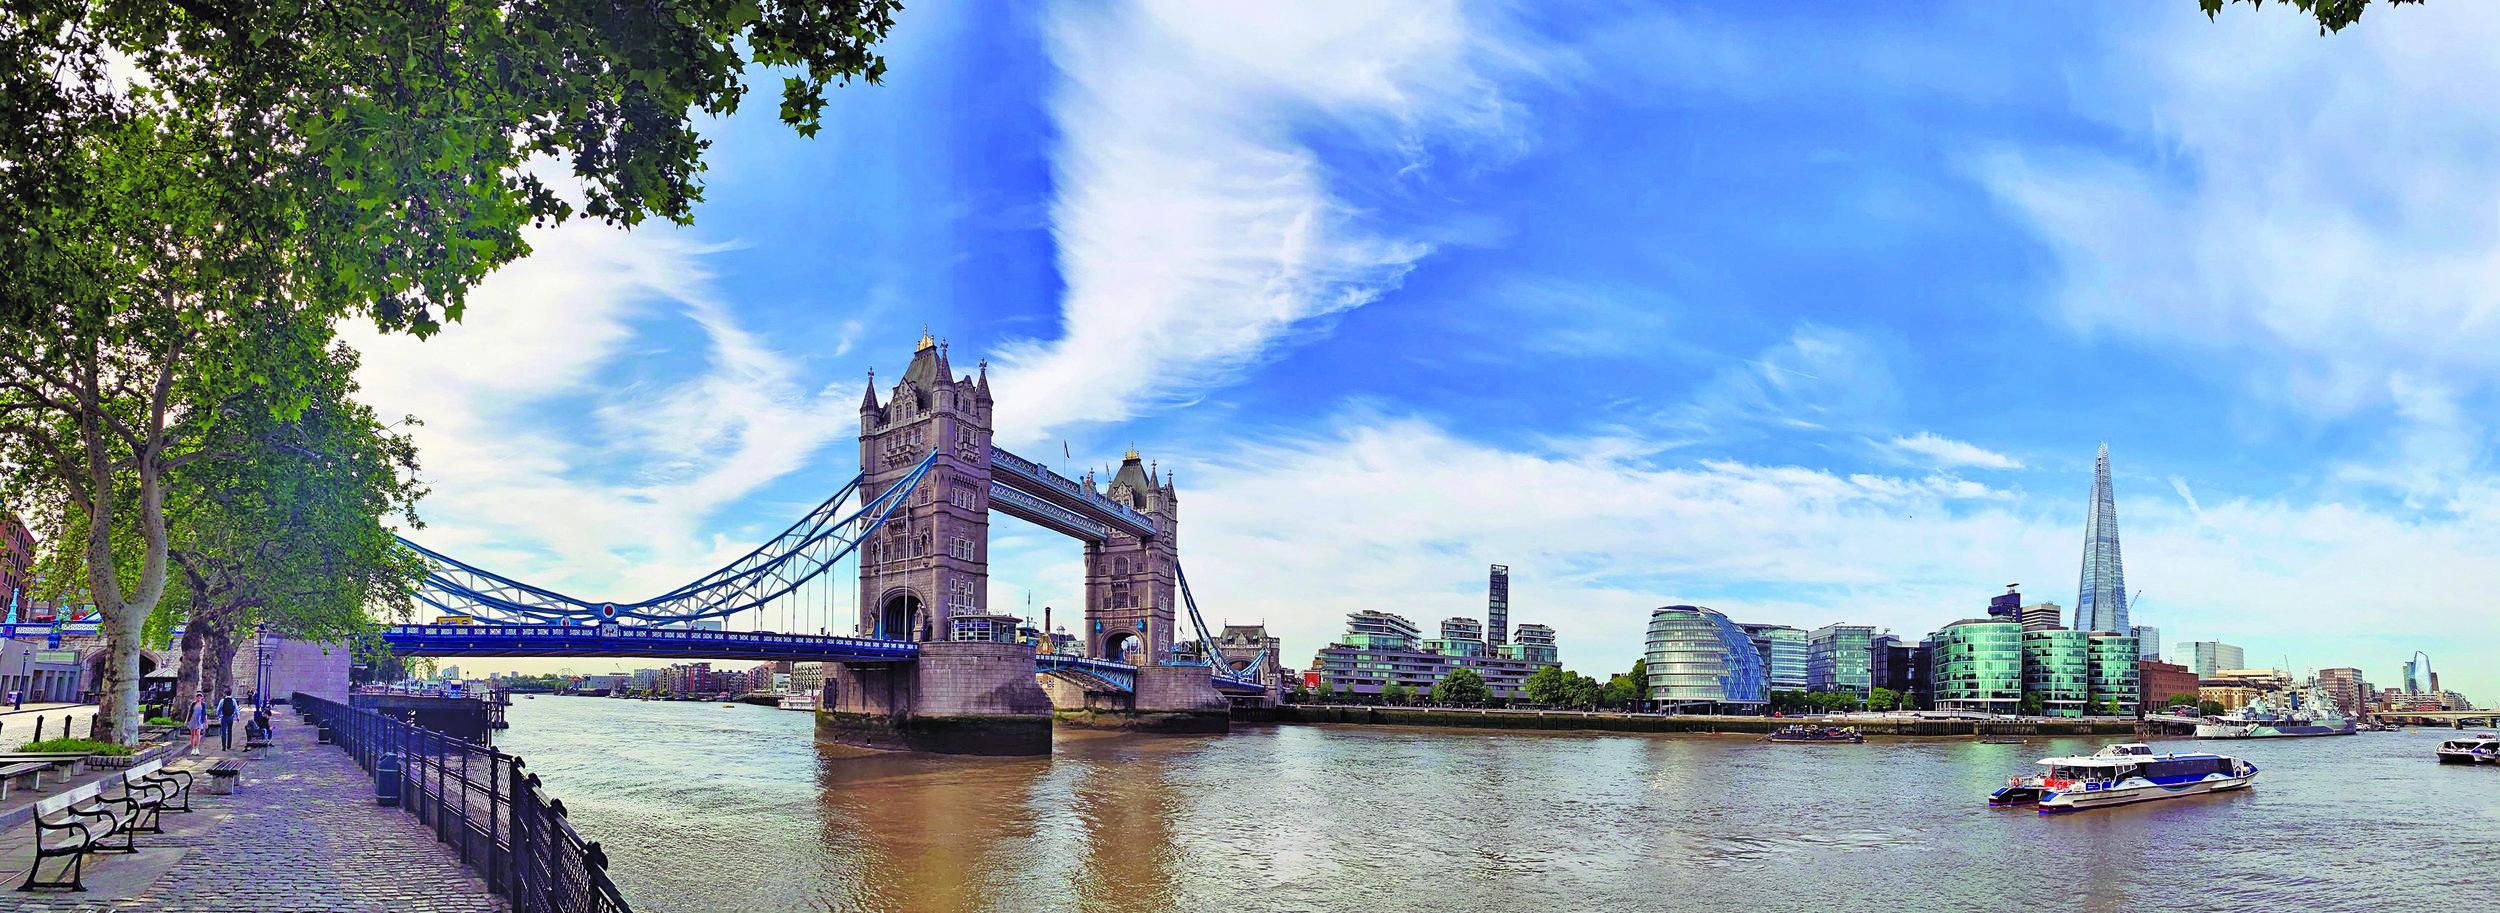 Tower Bridge & The Shard -London, England